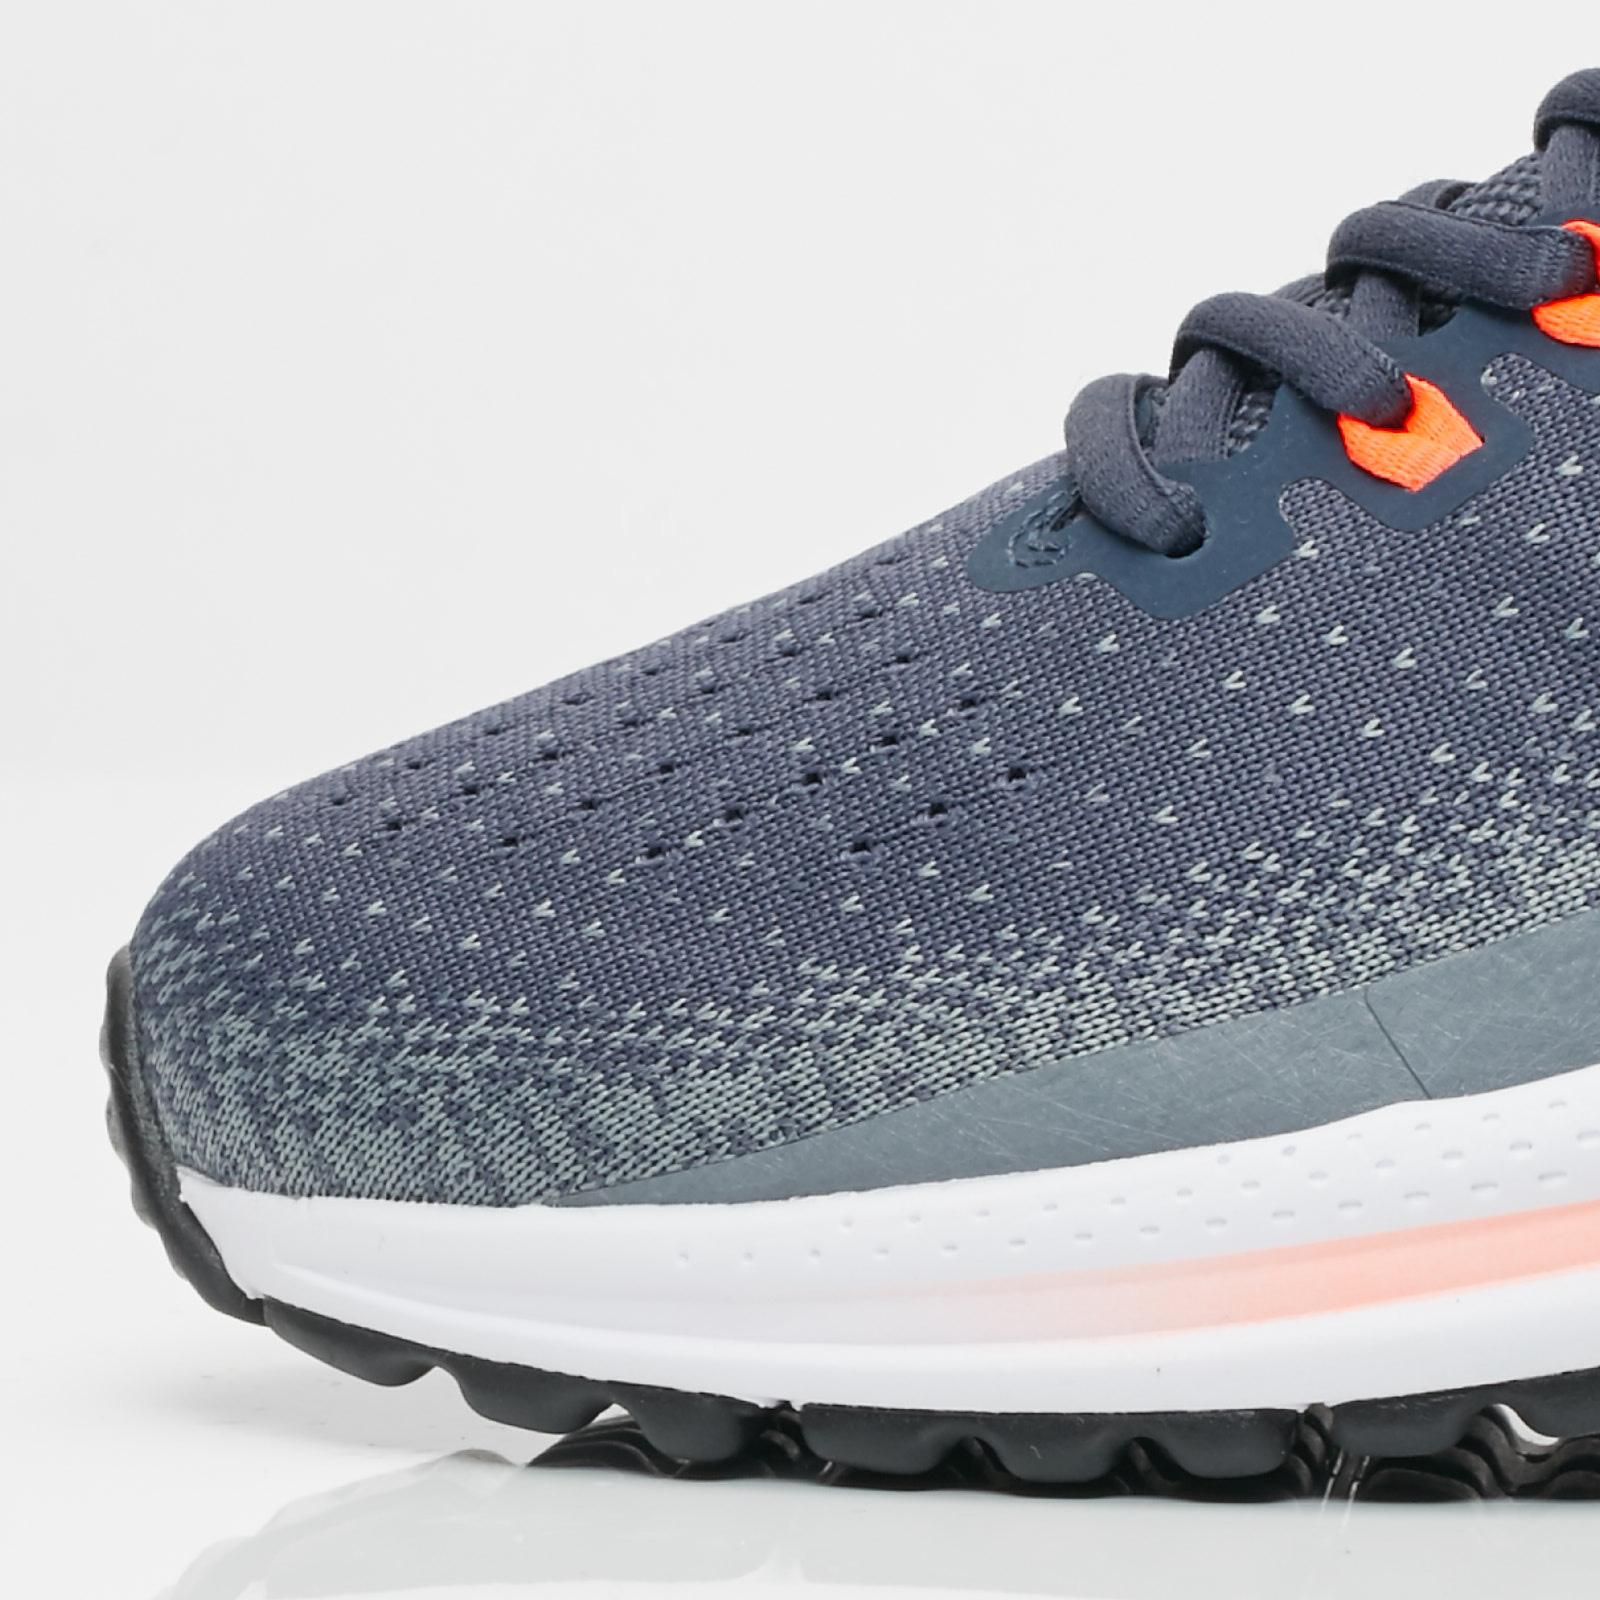 fd134043f223f Nike Air Zoom Vomero 13 - 922908-400 - Sneakersnstuff